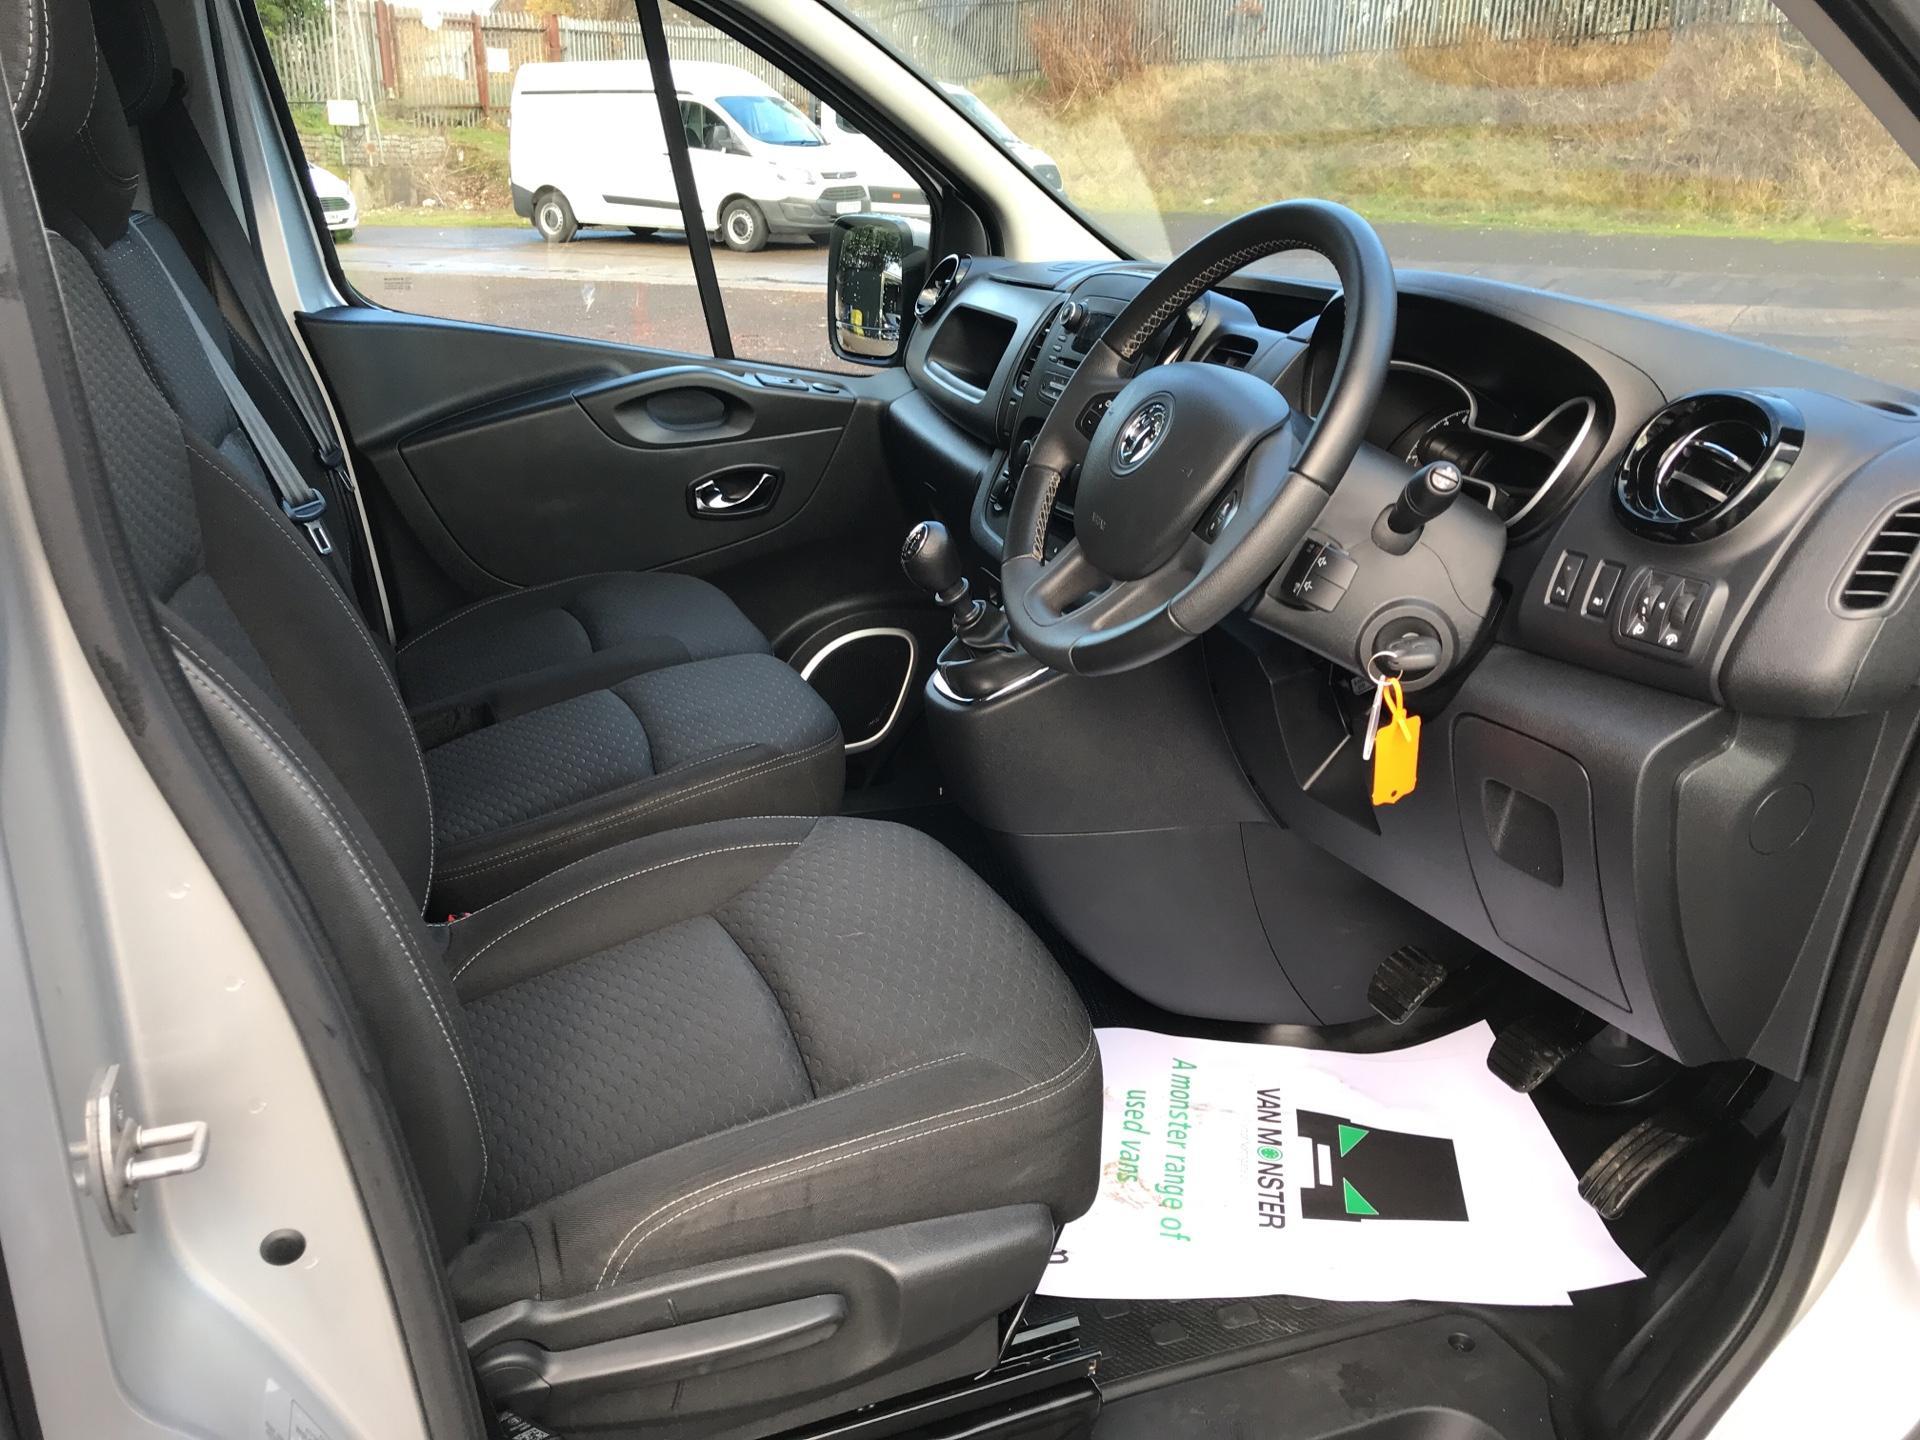 2017 Vauxhall Vivaro L1 H1 2700 1.6 CDTI 120PS SPORTIVE EURO 6 (ND17UNH) Image 9